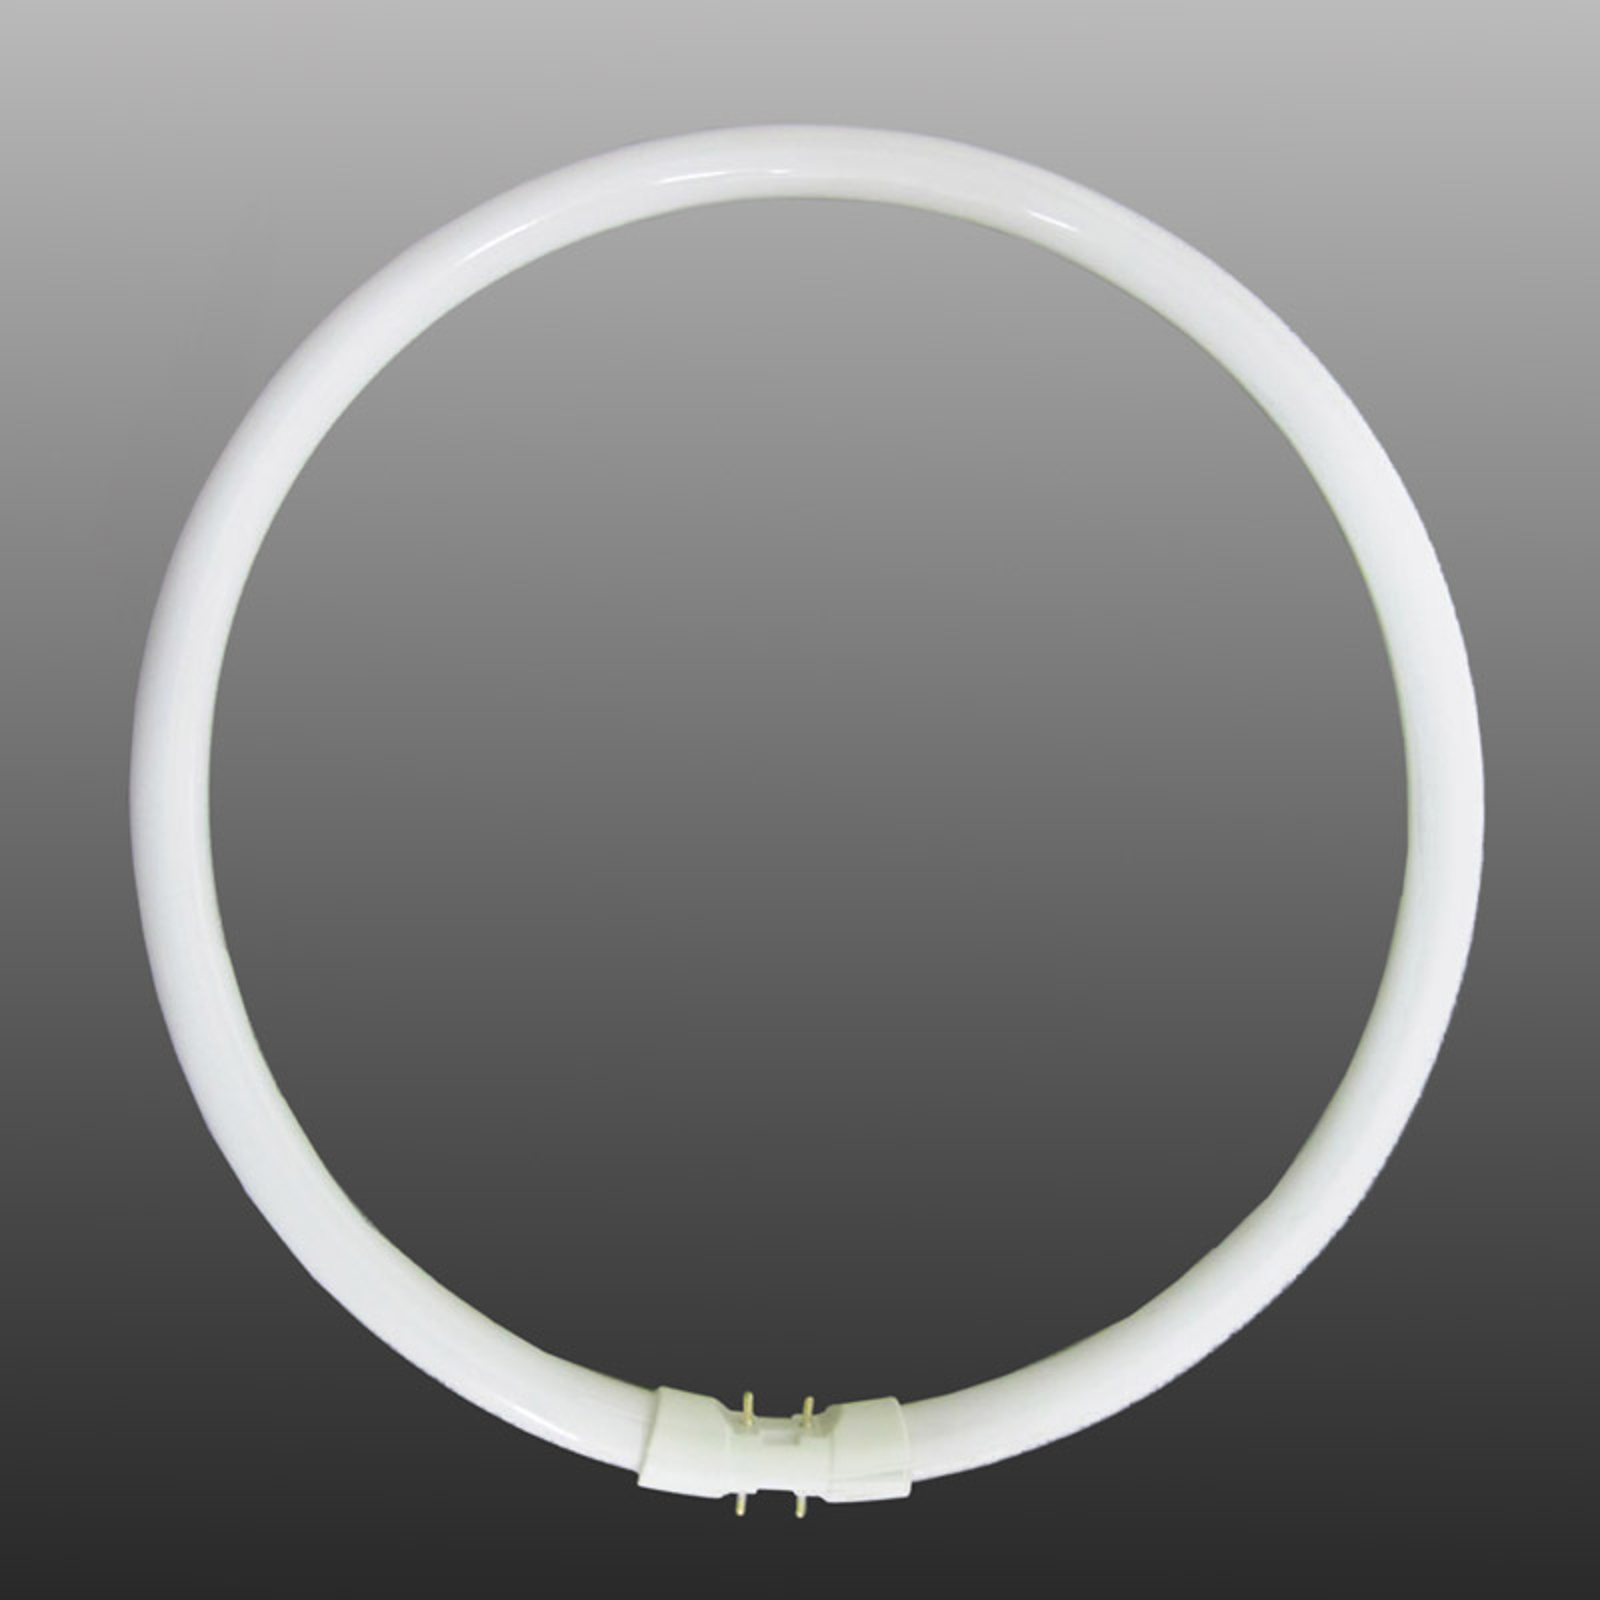 2GX13 T5 40W rengasloistelamppu, perusvalkoinen